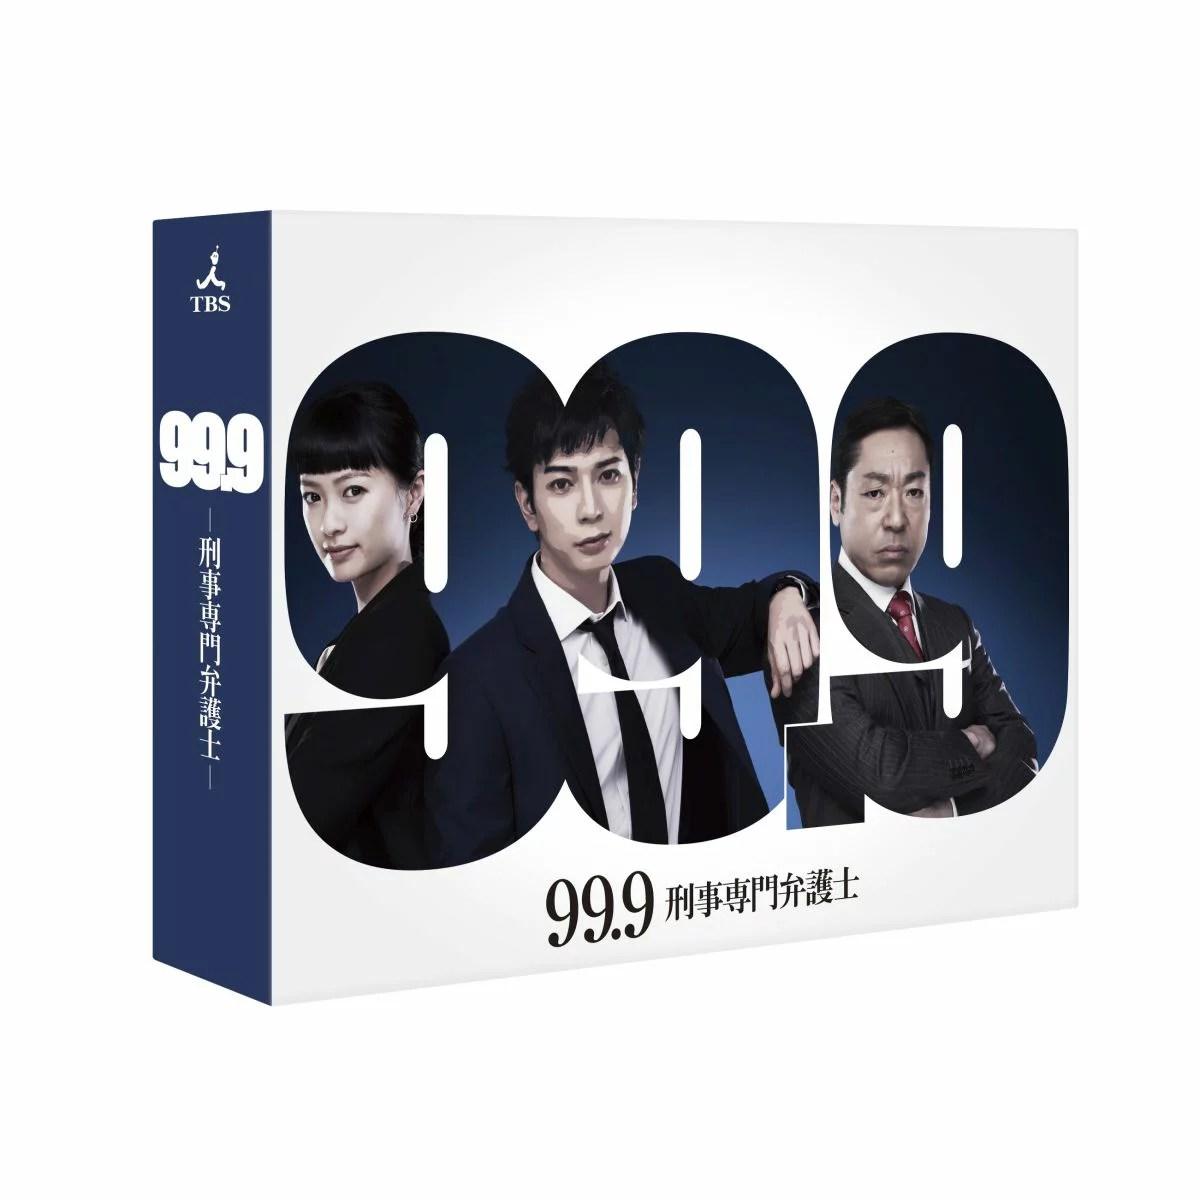 99.9-刑事専門弁護士ーDVD-BOX [ 松本潤 ] - 楽天ブックス